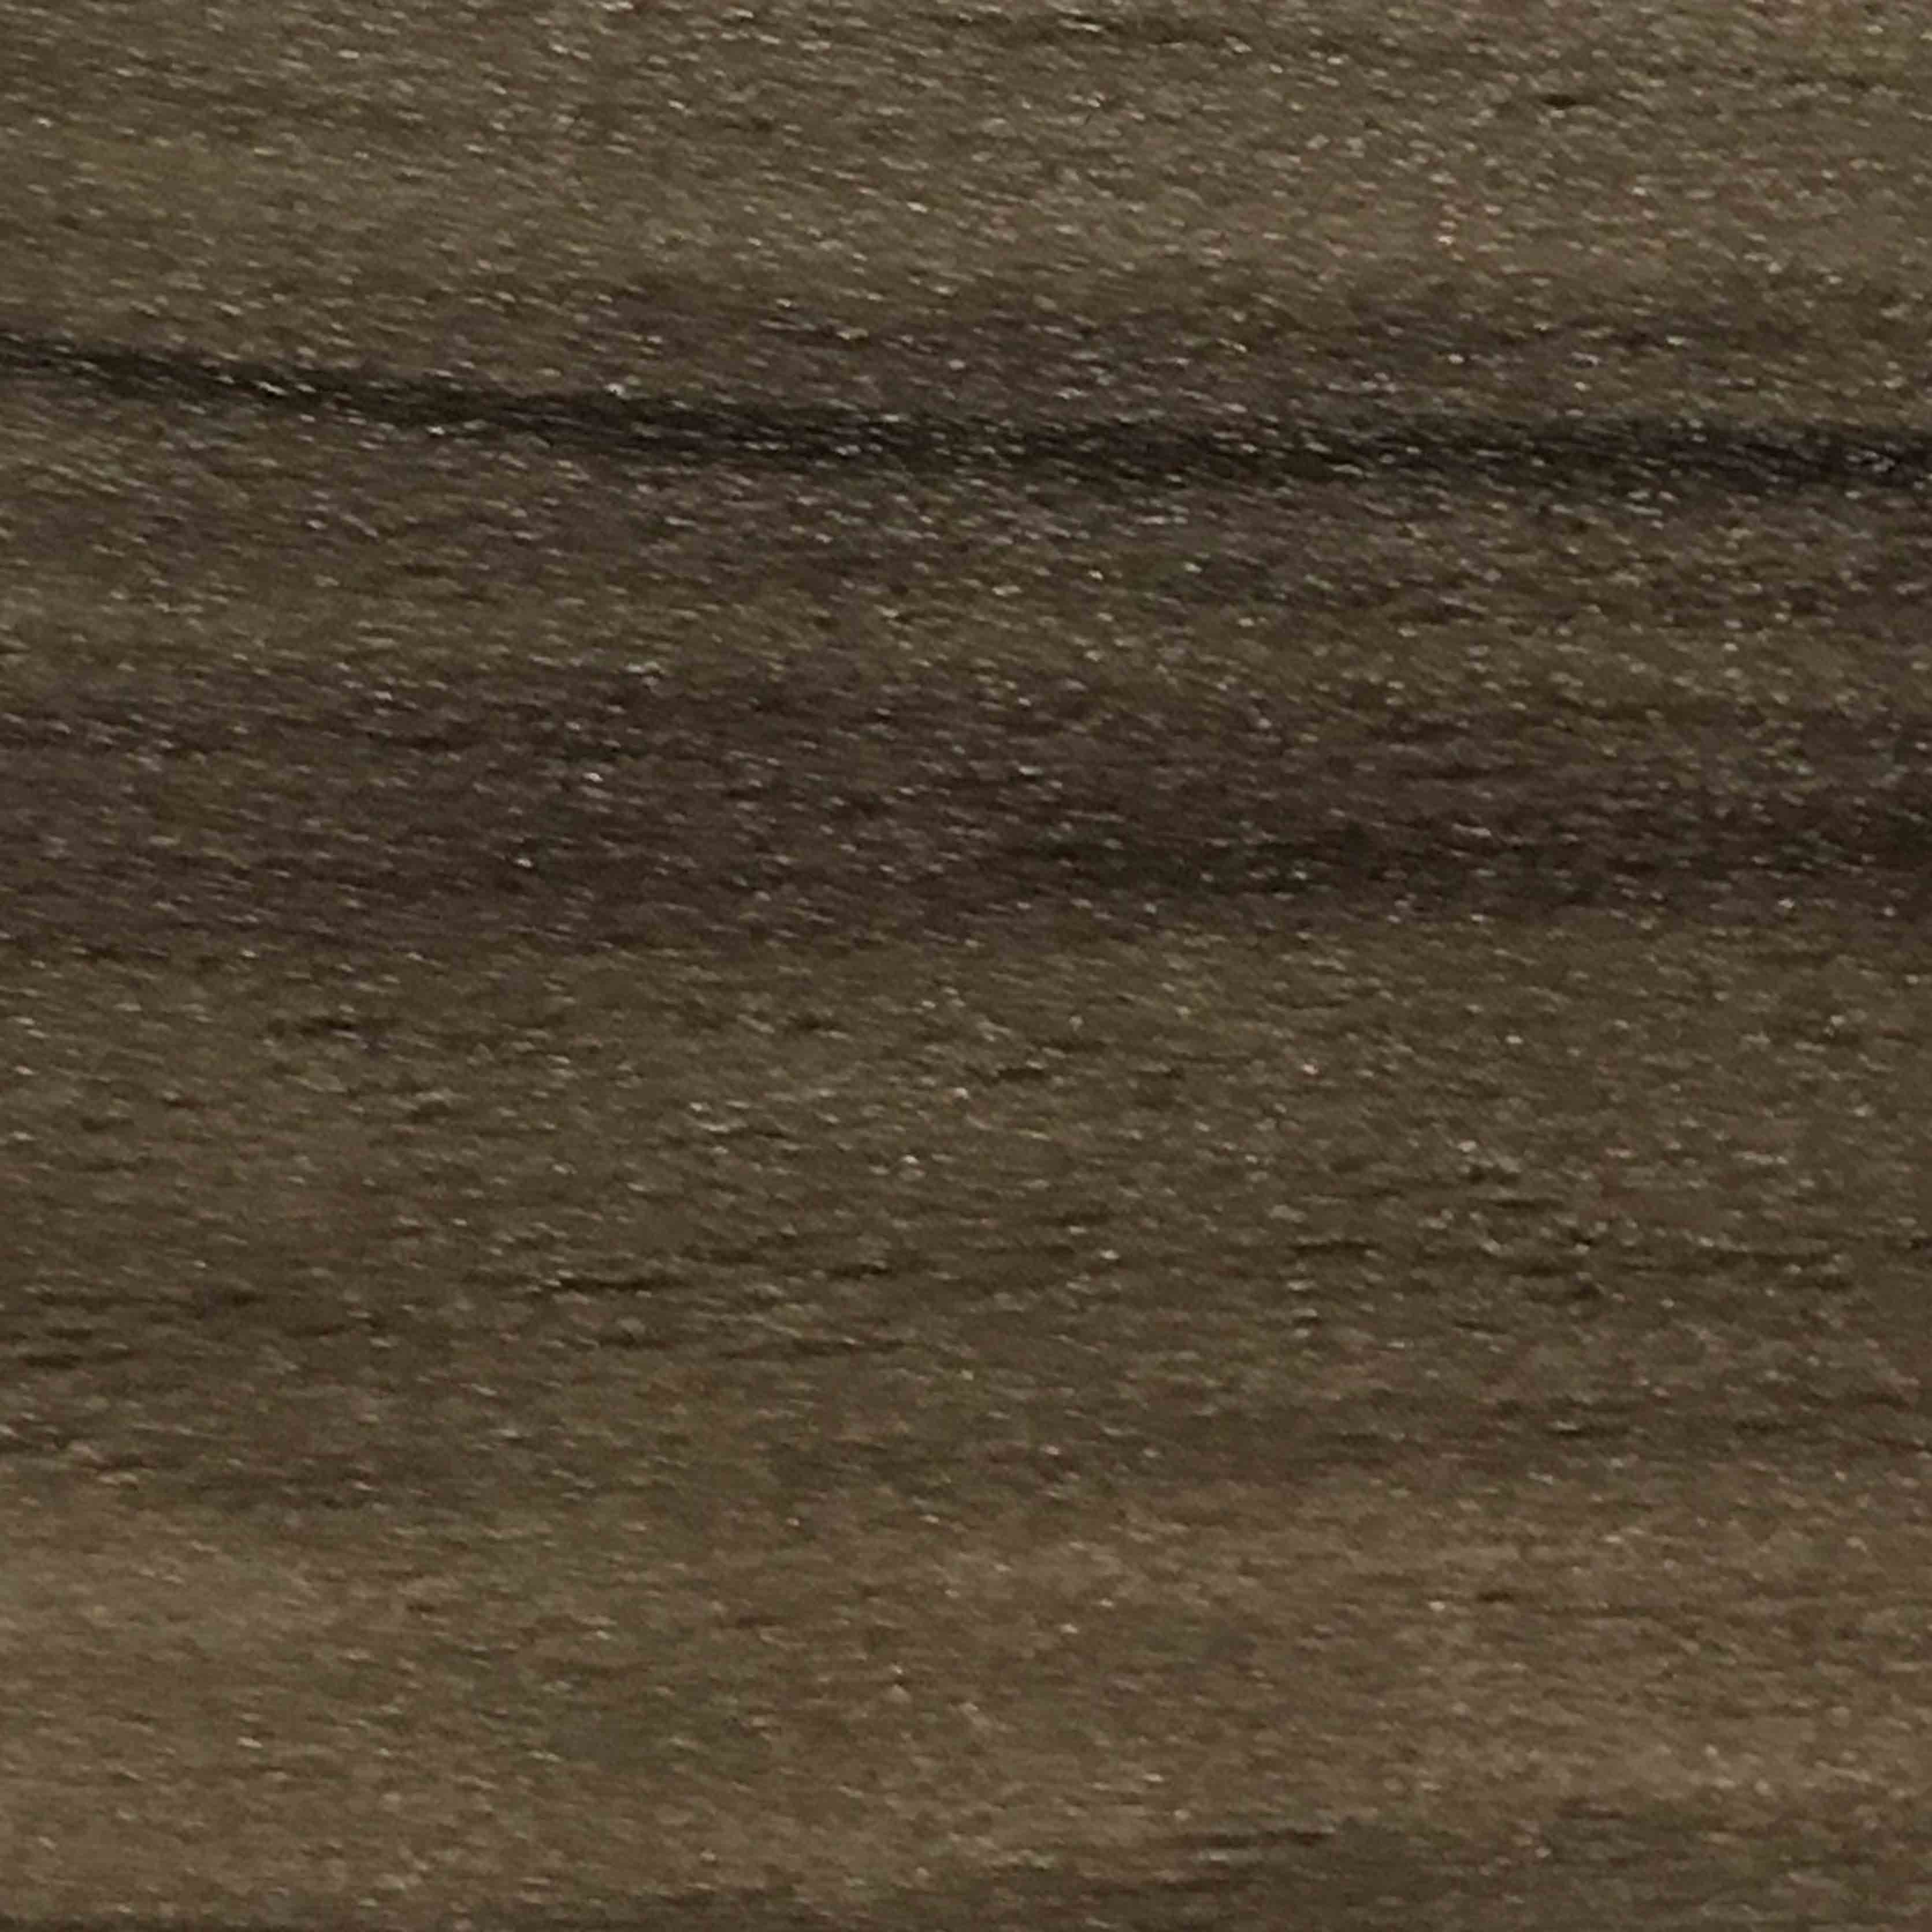 Decal vân gỗ - 1612